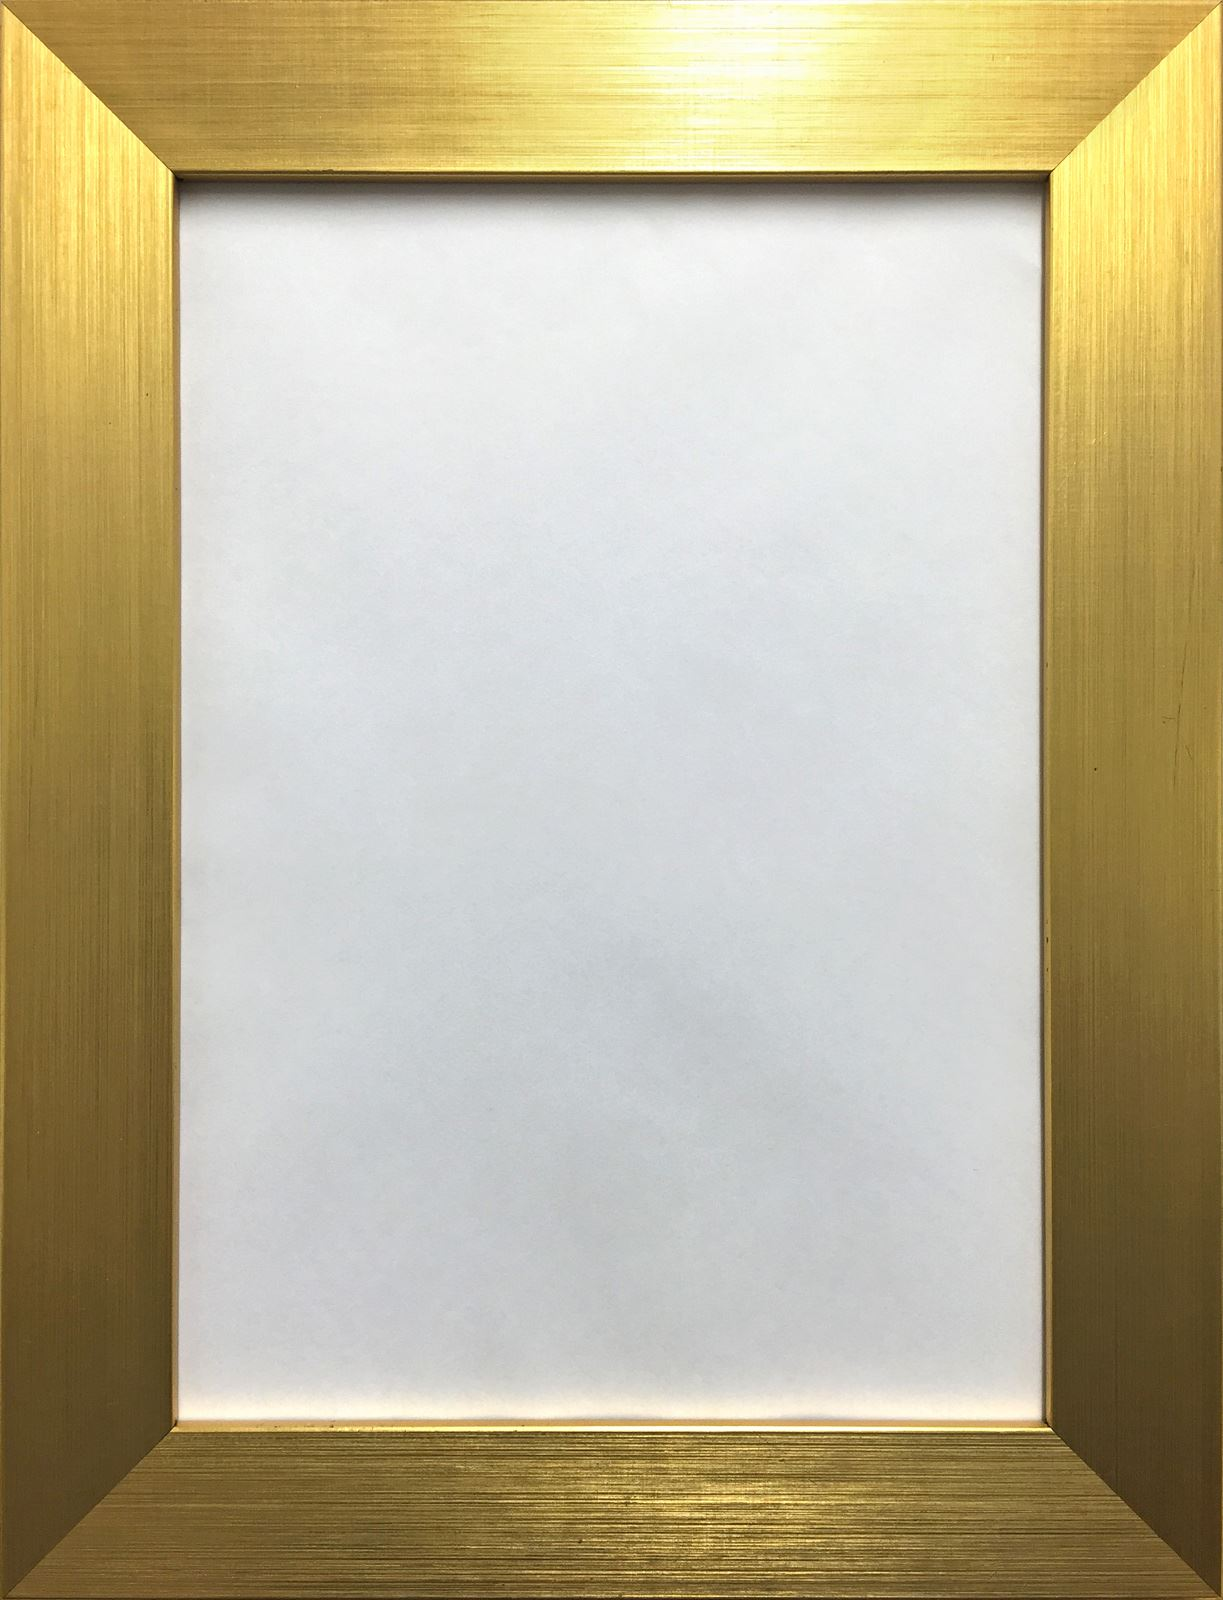 Photo poster frames